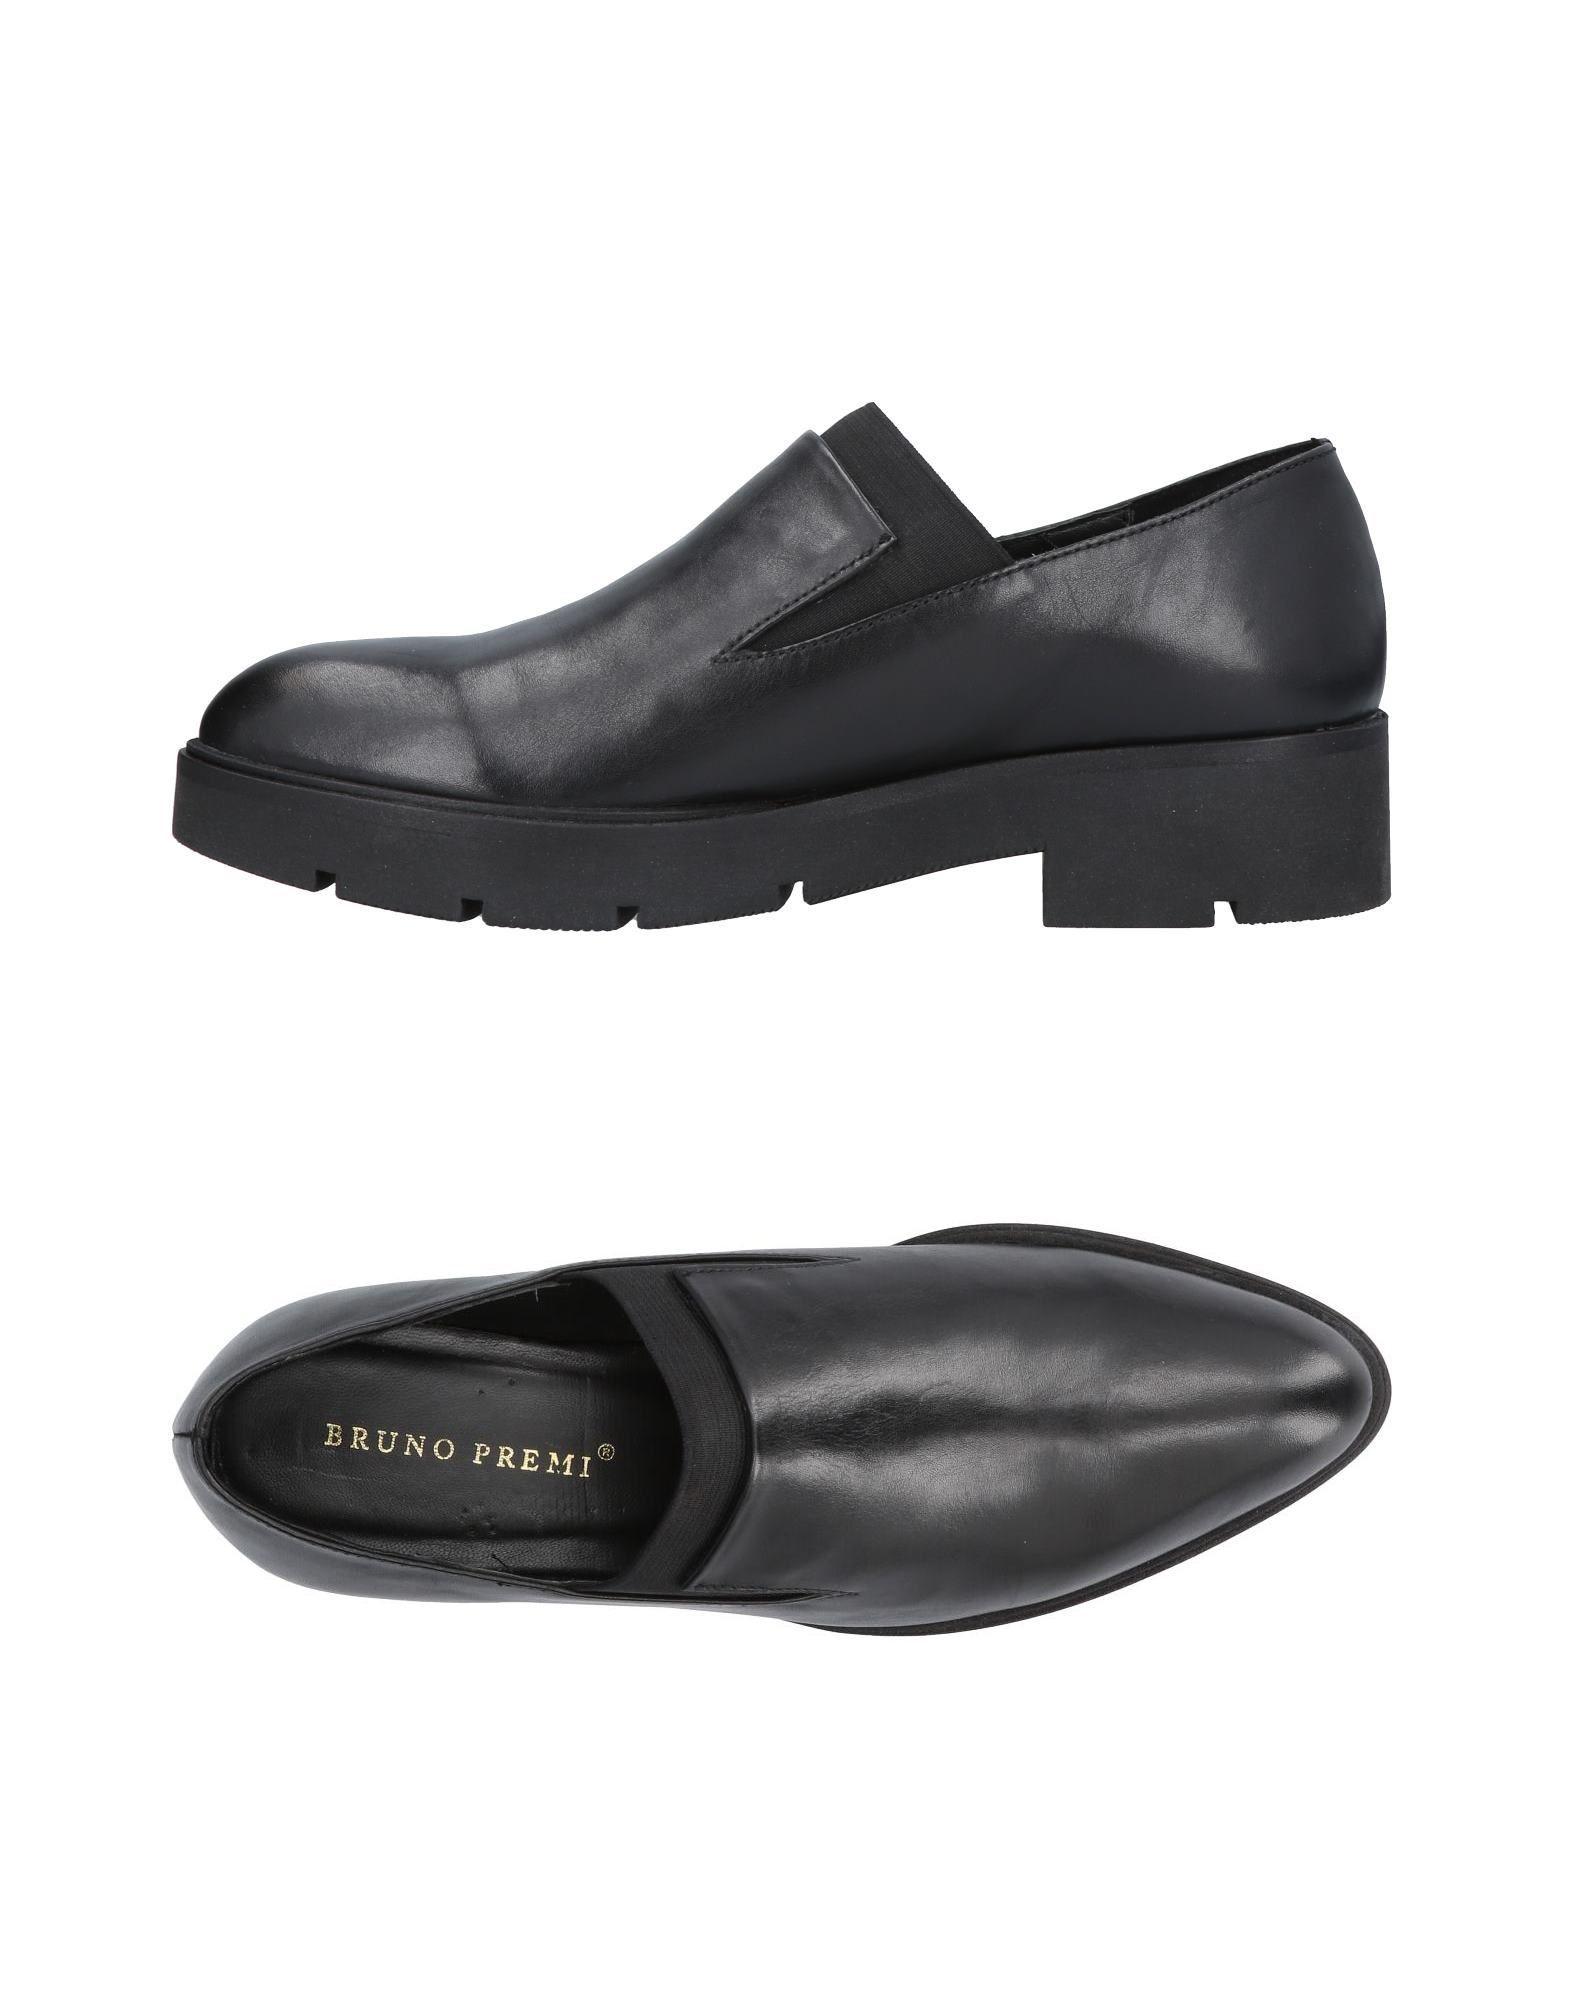 Bruno Premi Mokassins Damen  11431232MU Gute Qualität beliebte Schuhe